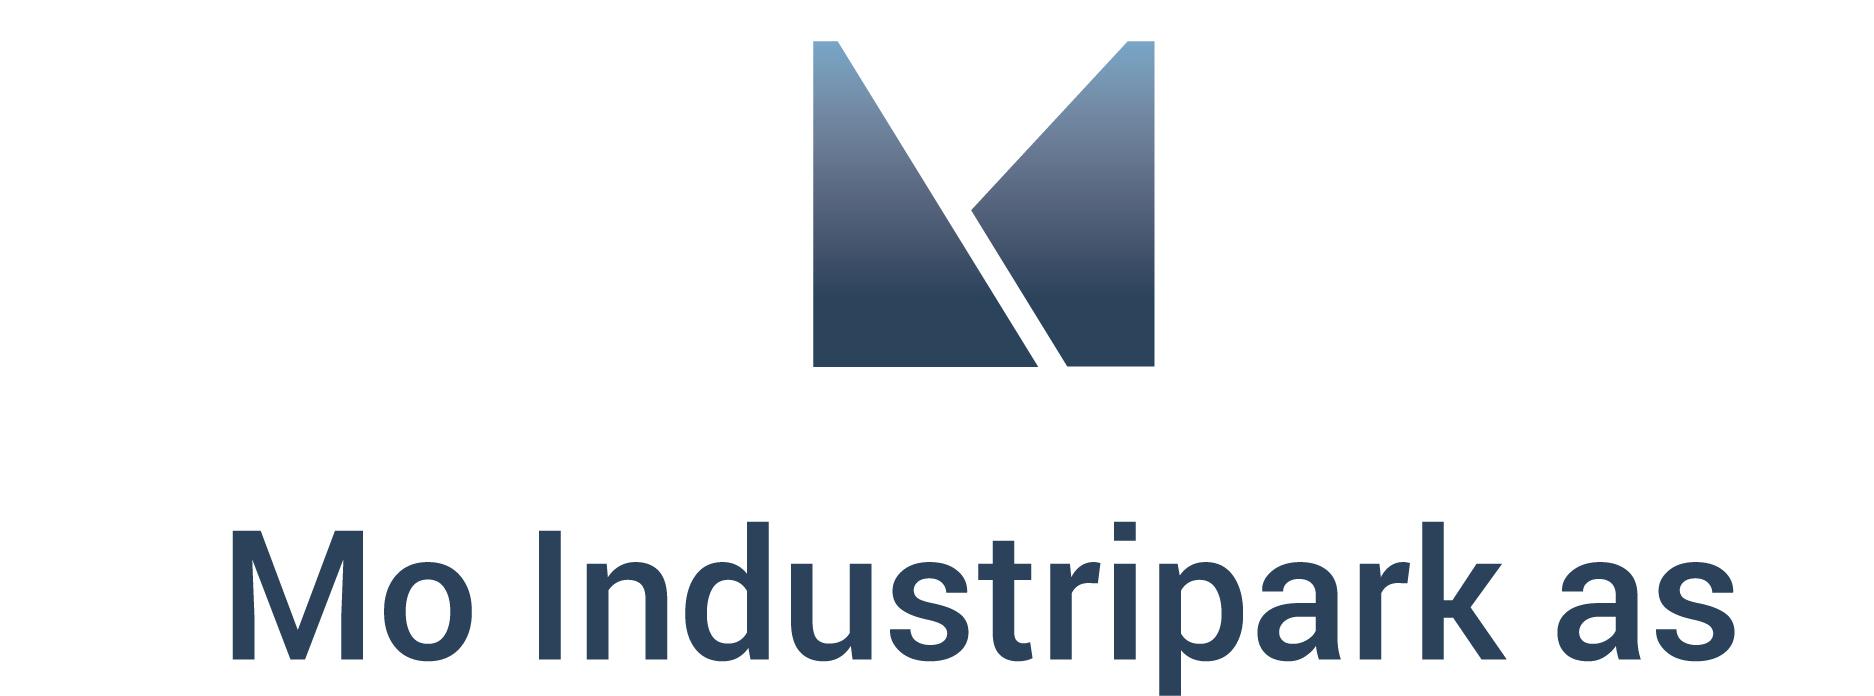 Mo Industripark AS